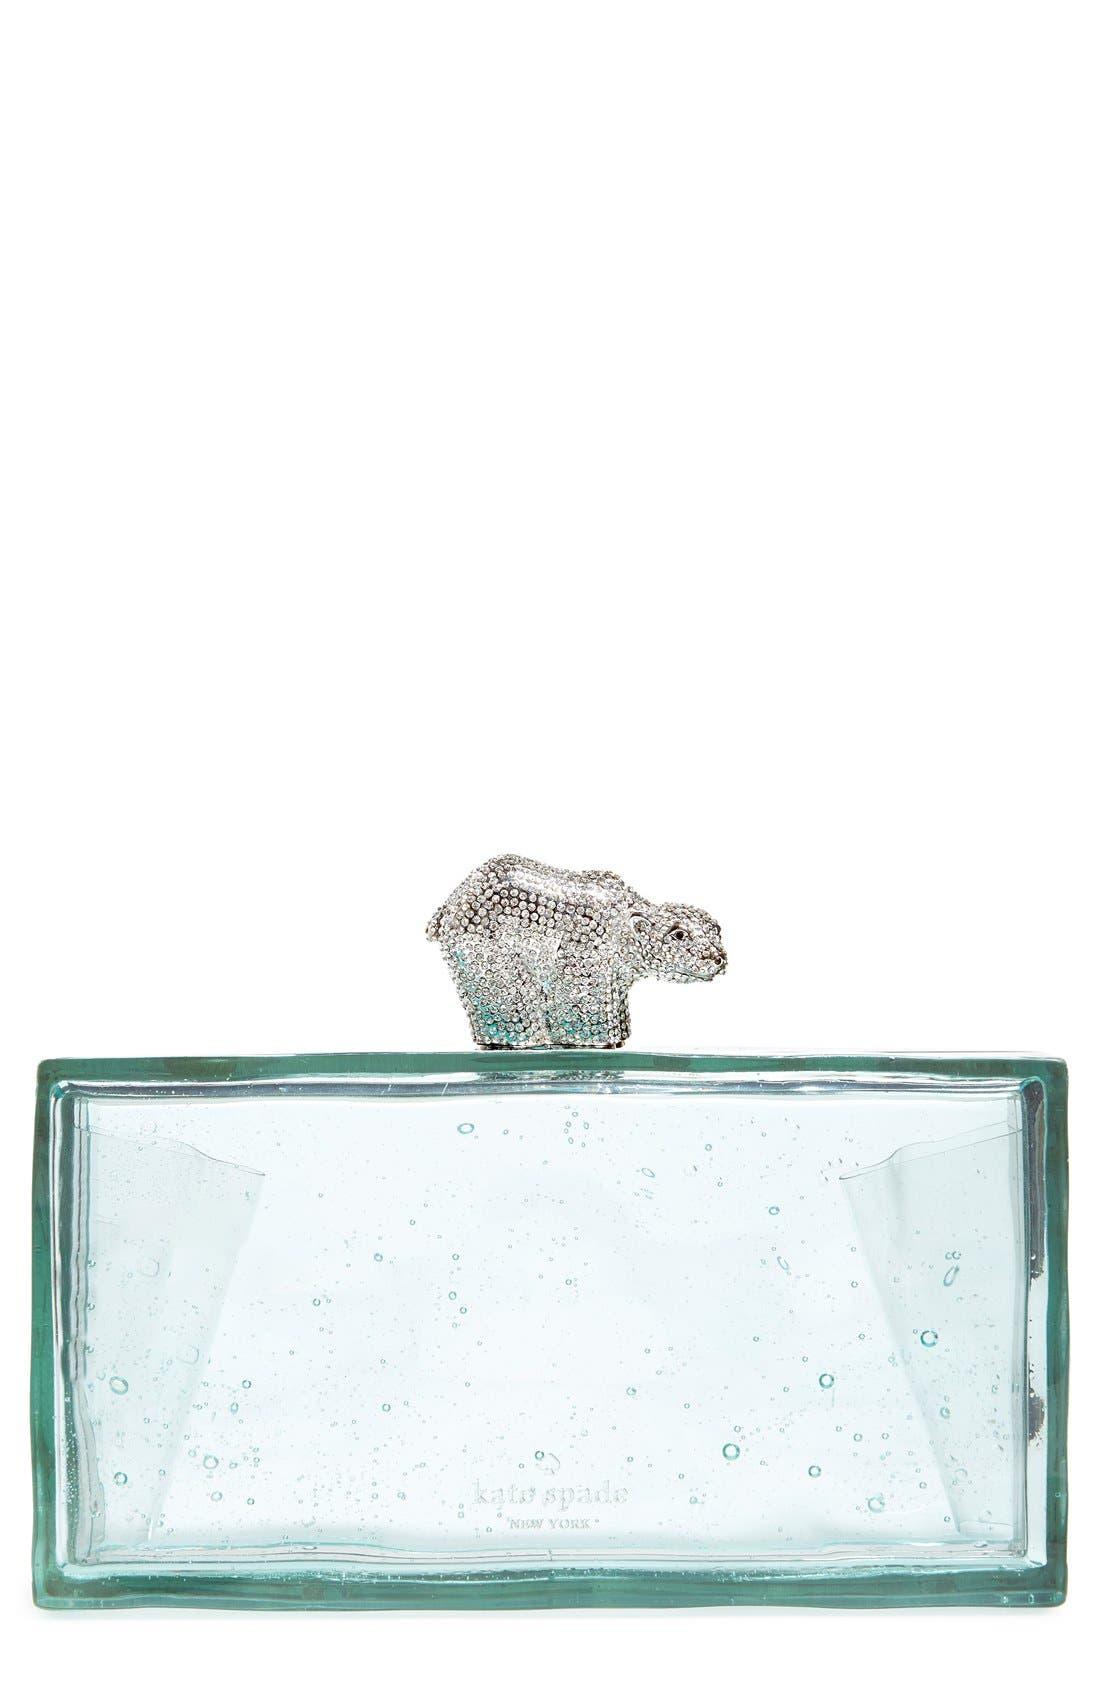 Alternate Image 1 Selected - kate spade new york 'polar bear on ice' clutch